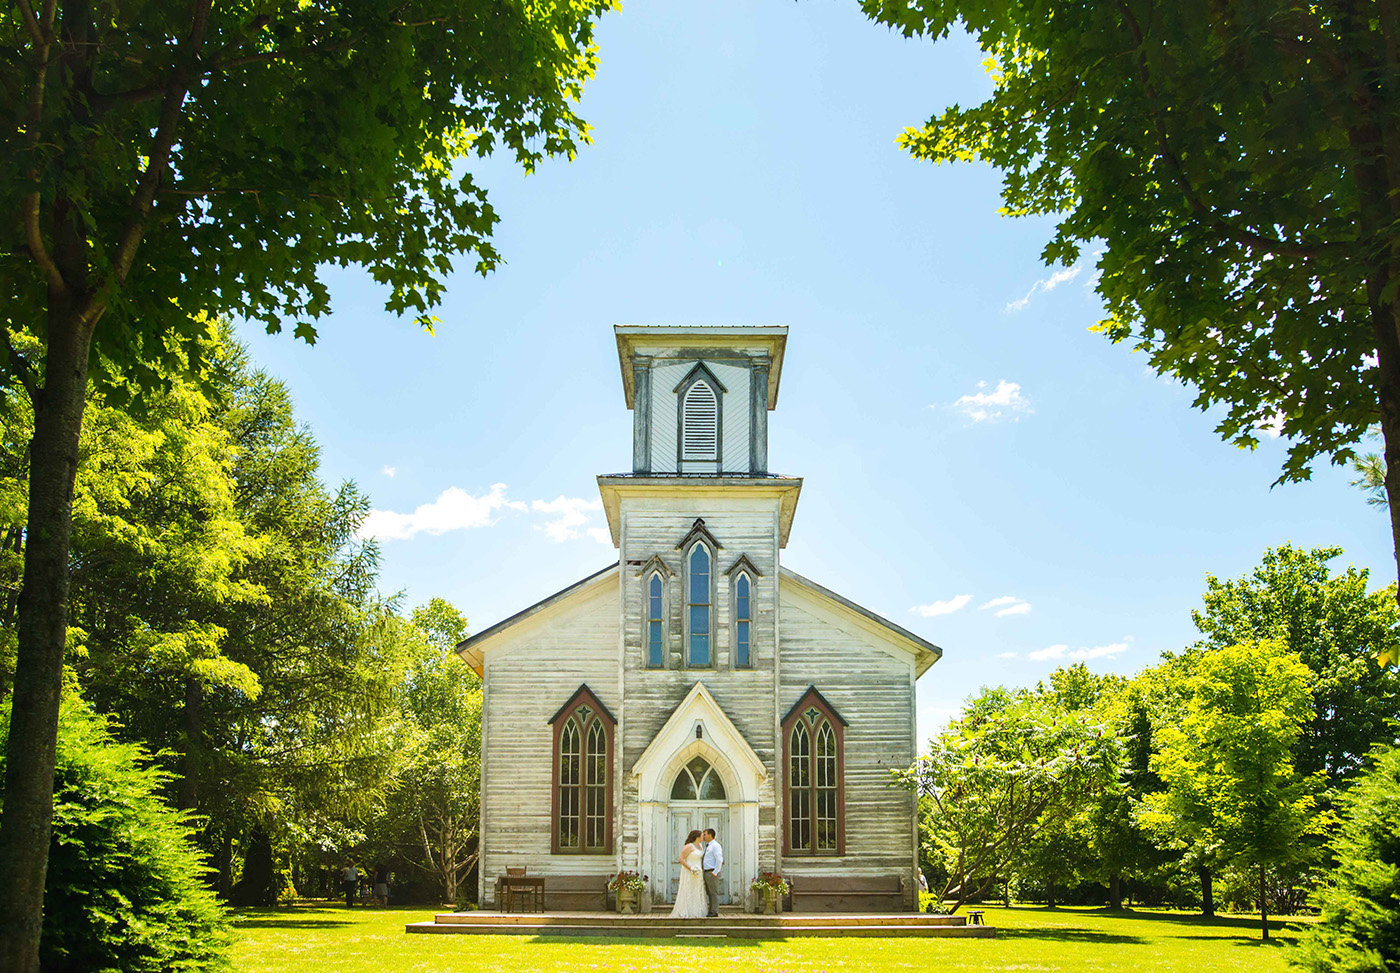 Chris-Carries-Church-Wedding-in-Simcoe-Ontario.jpg